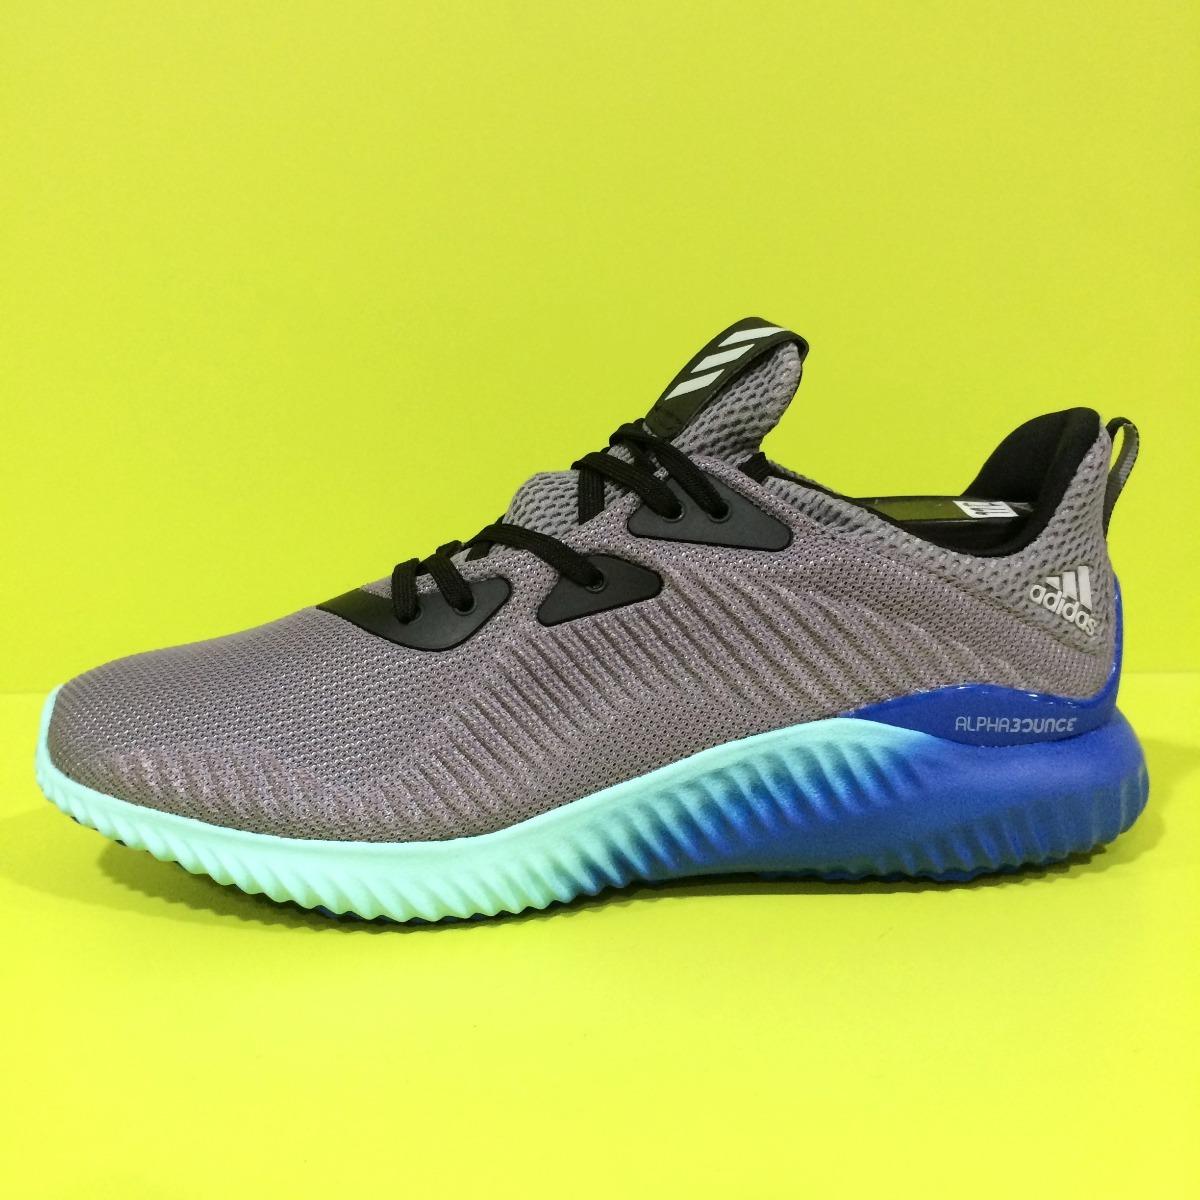 126c441a4f2c zapatos-adidas-originales-alphabounce-para-hombres-bb9035-D_NQ_NP_624246-MLV26643992436_012018-F.jpg